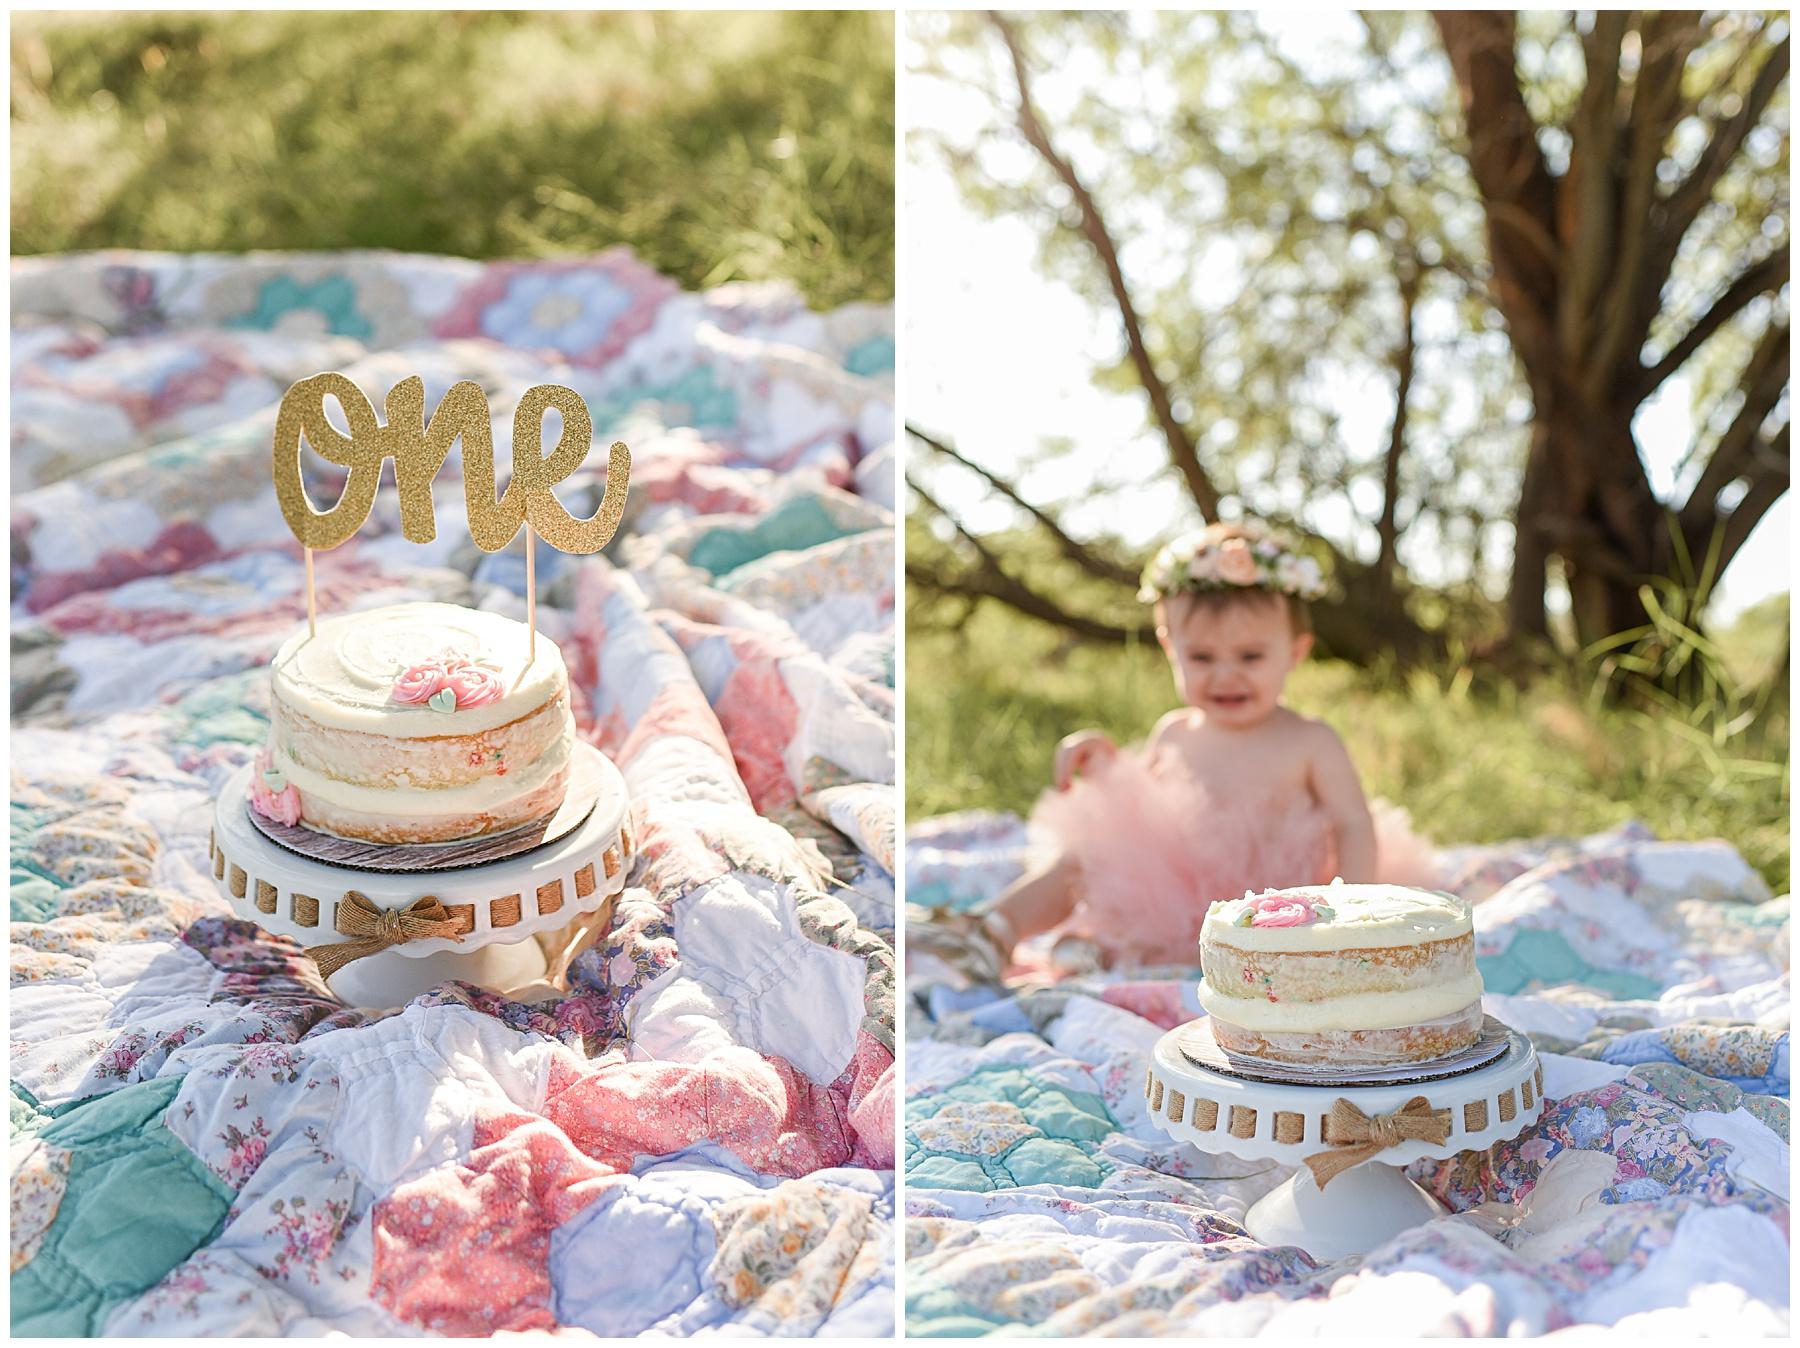 Phoenix Vintage First Birthday cake Smash session | SweetLife Photography